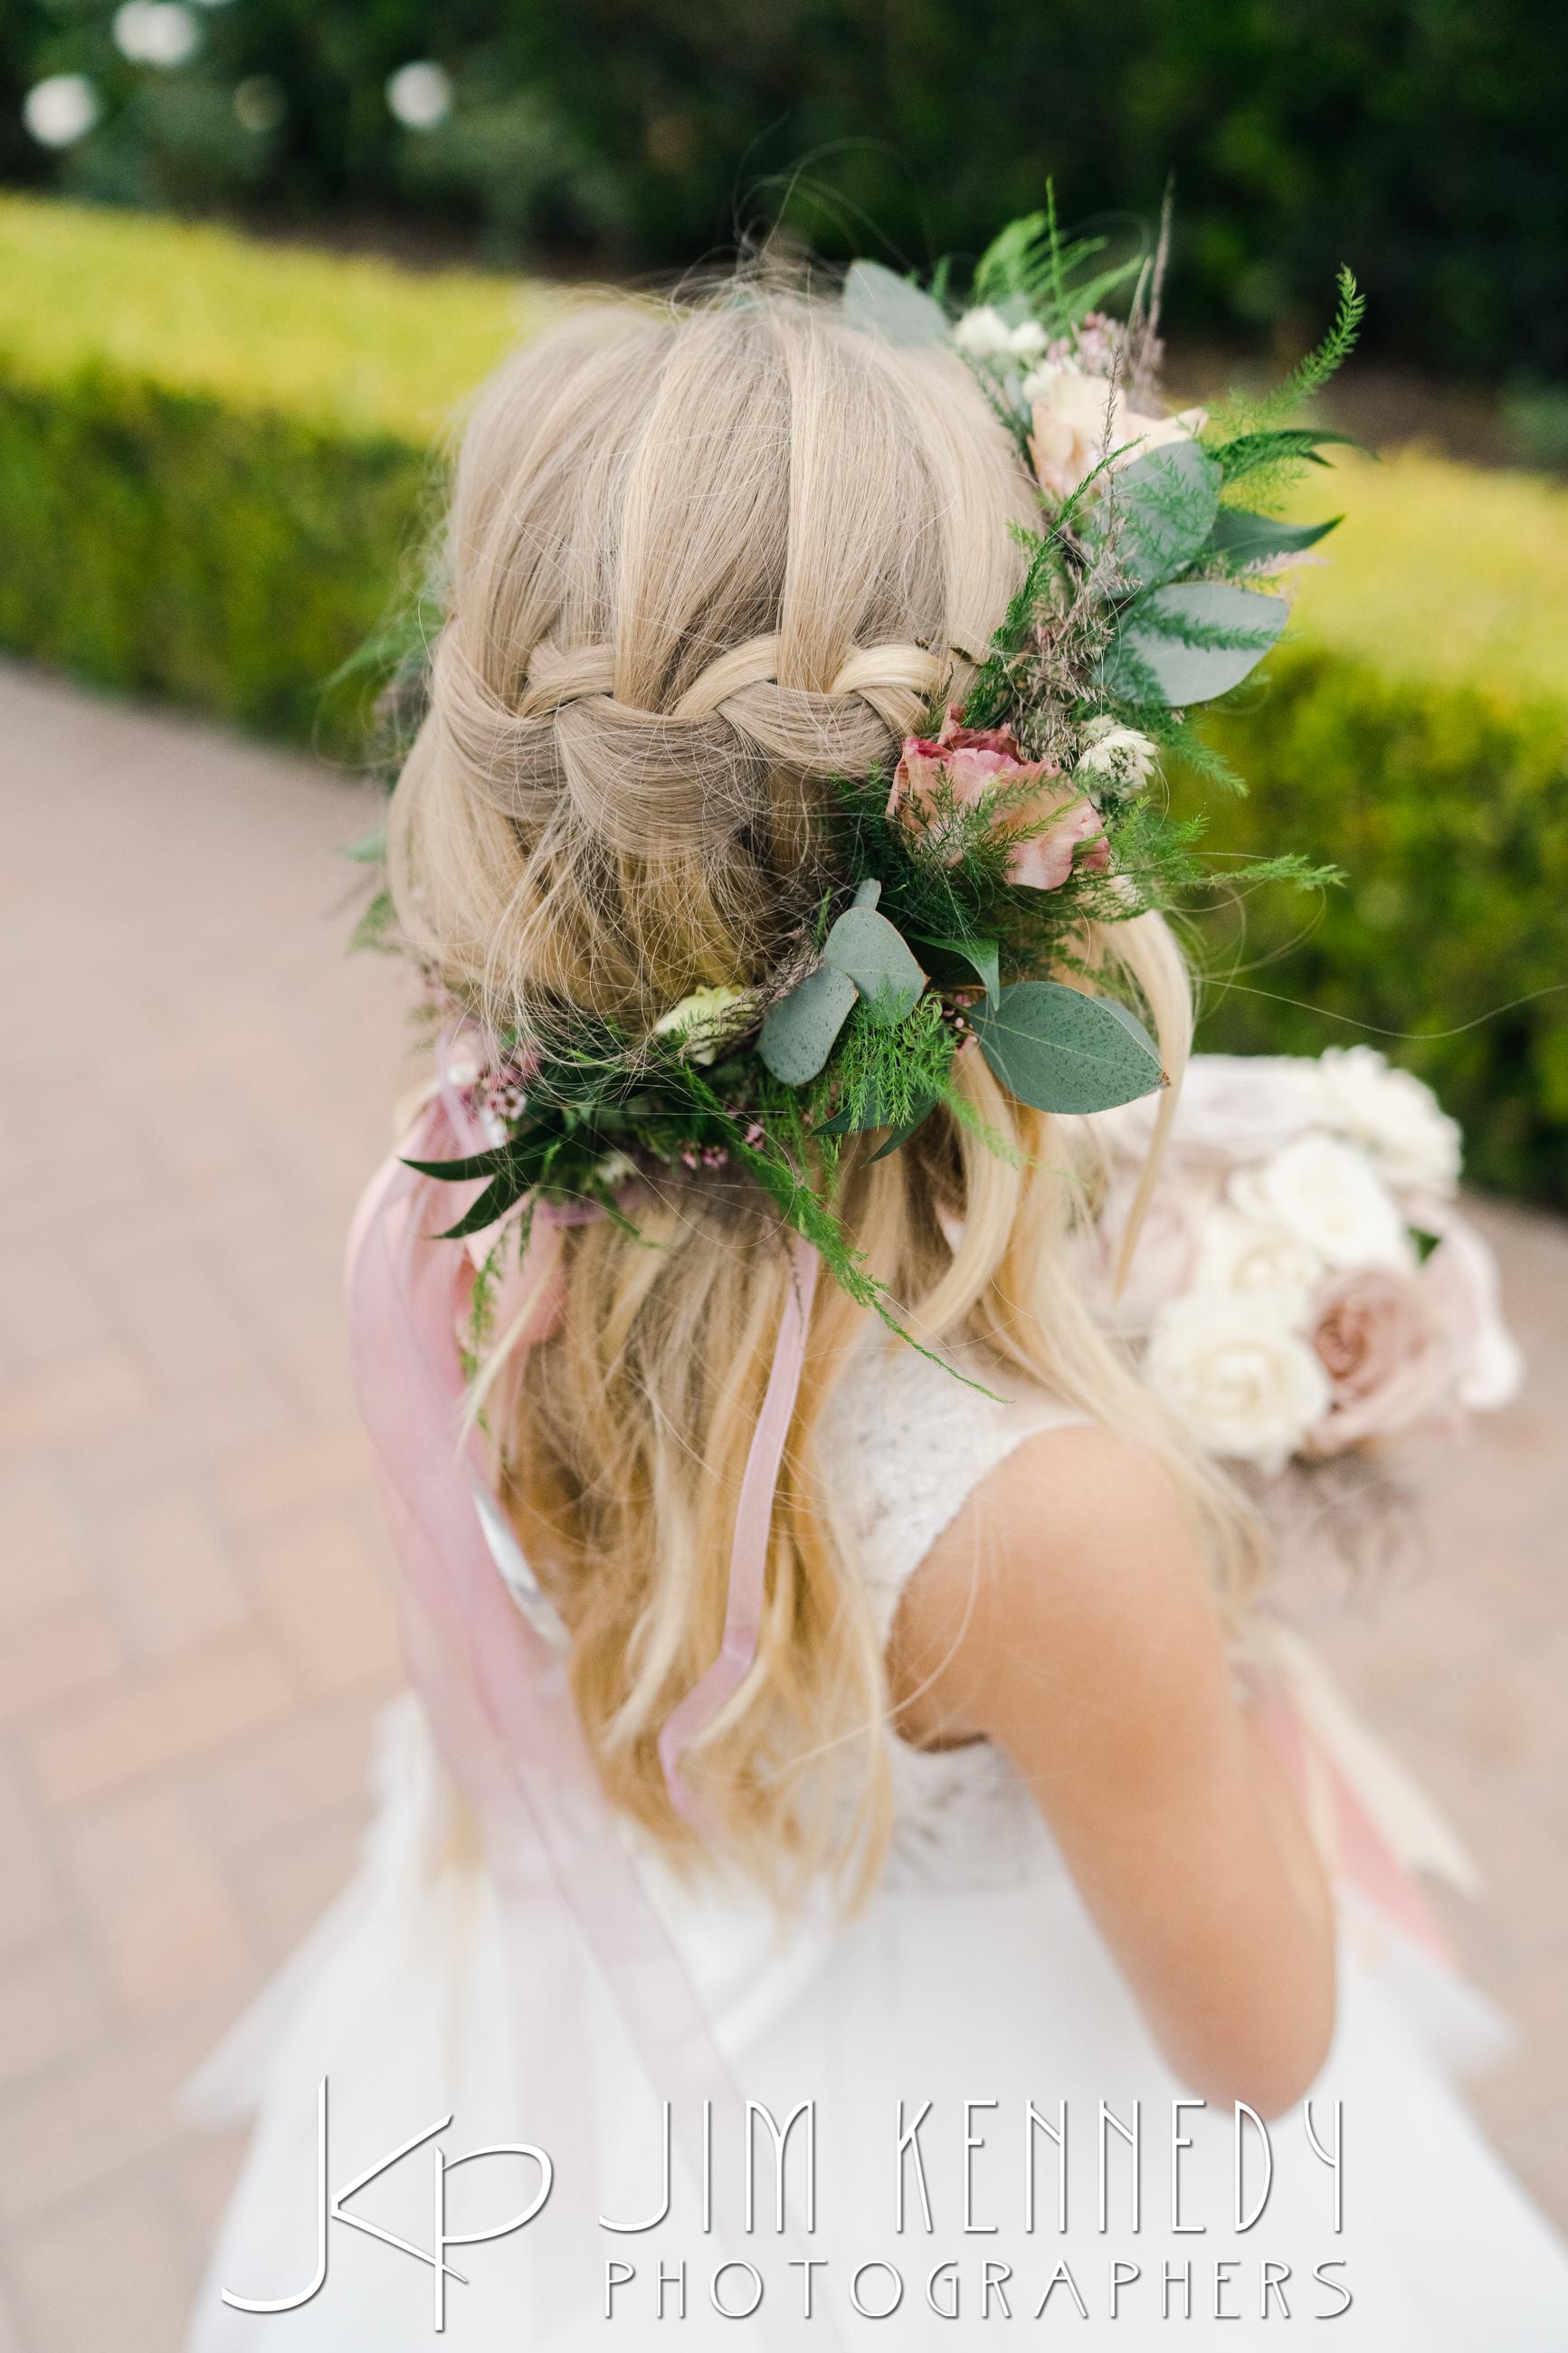 pelican-hill-wedding-jim-kenedy-photographers_0136.JPG